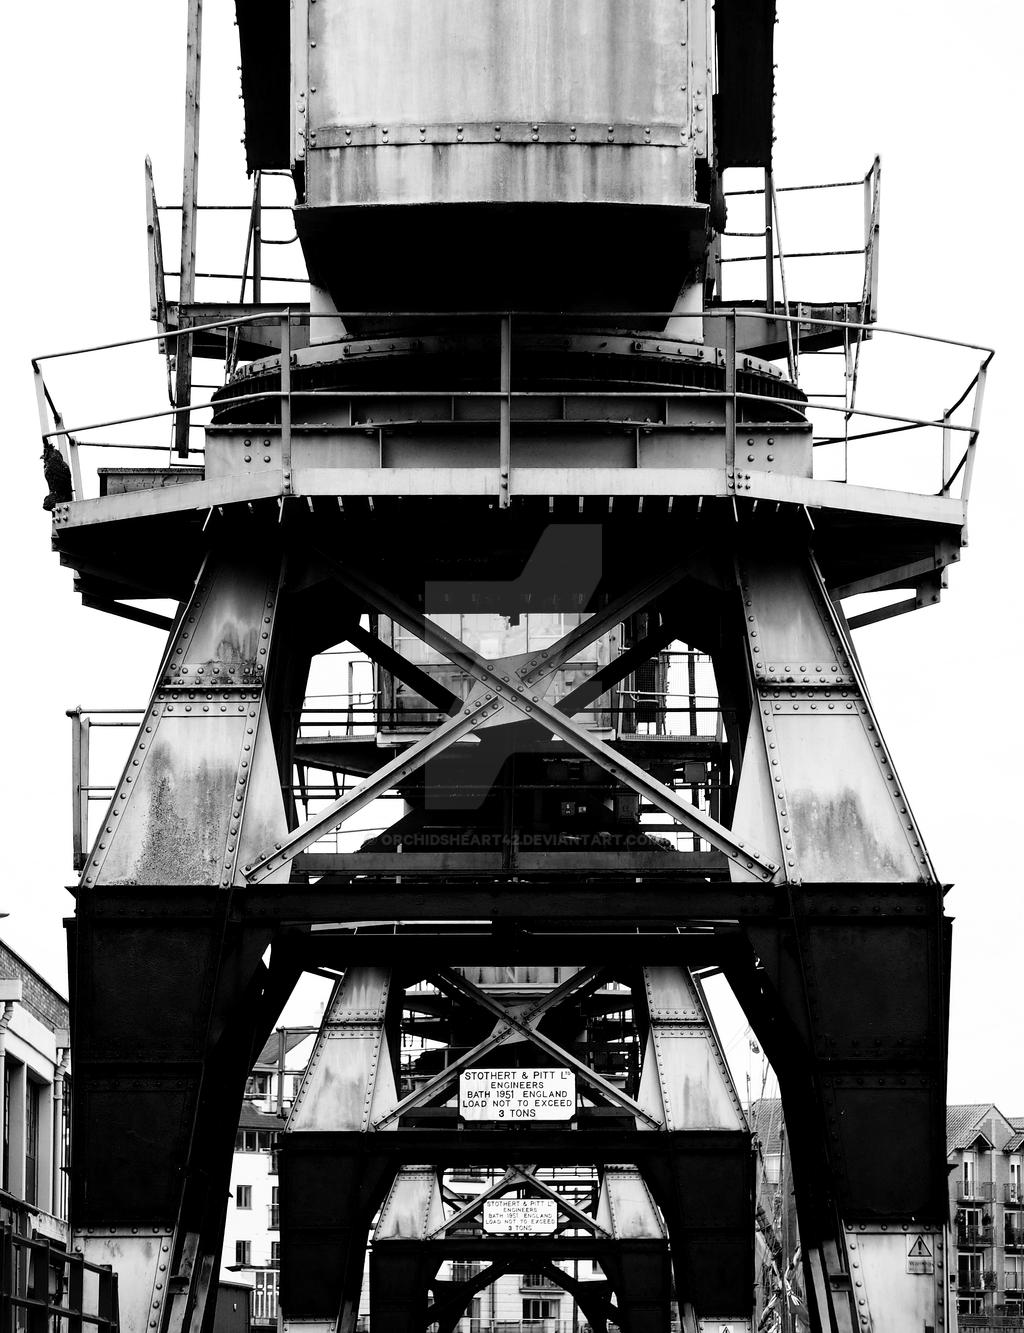 Bristol Docks 008 by OrchidsHeart42